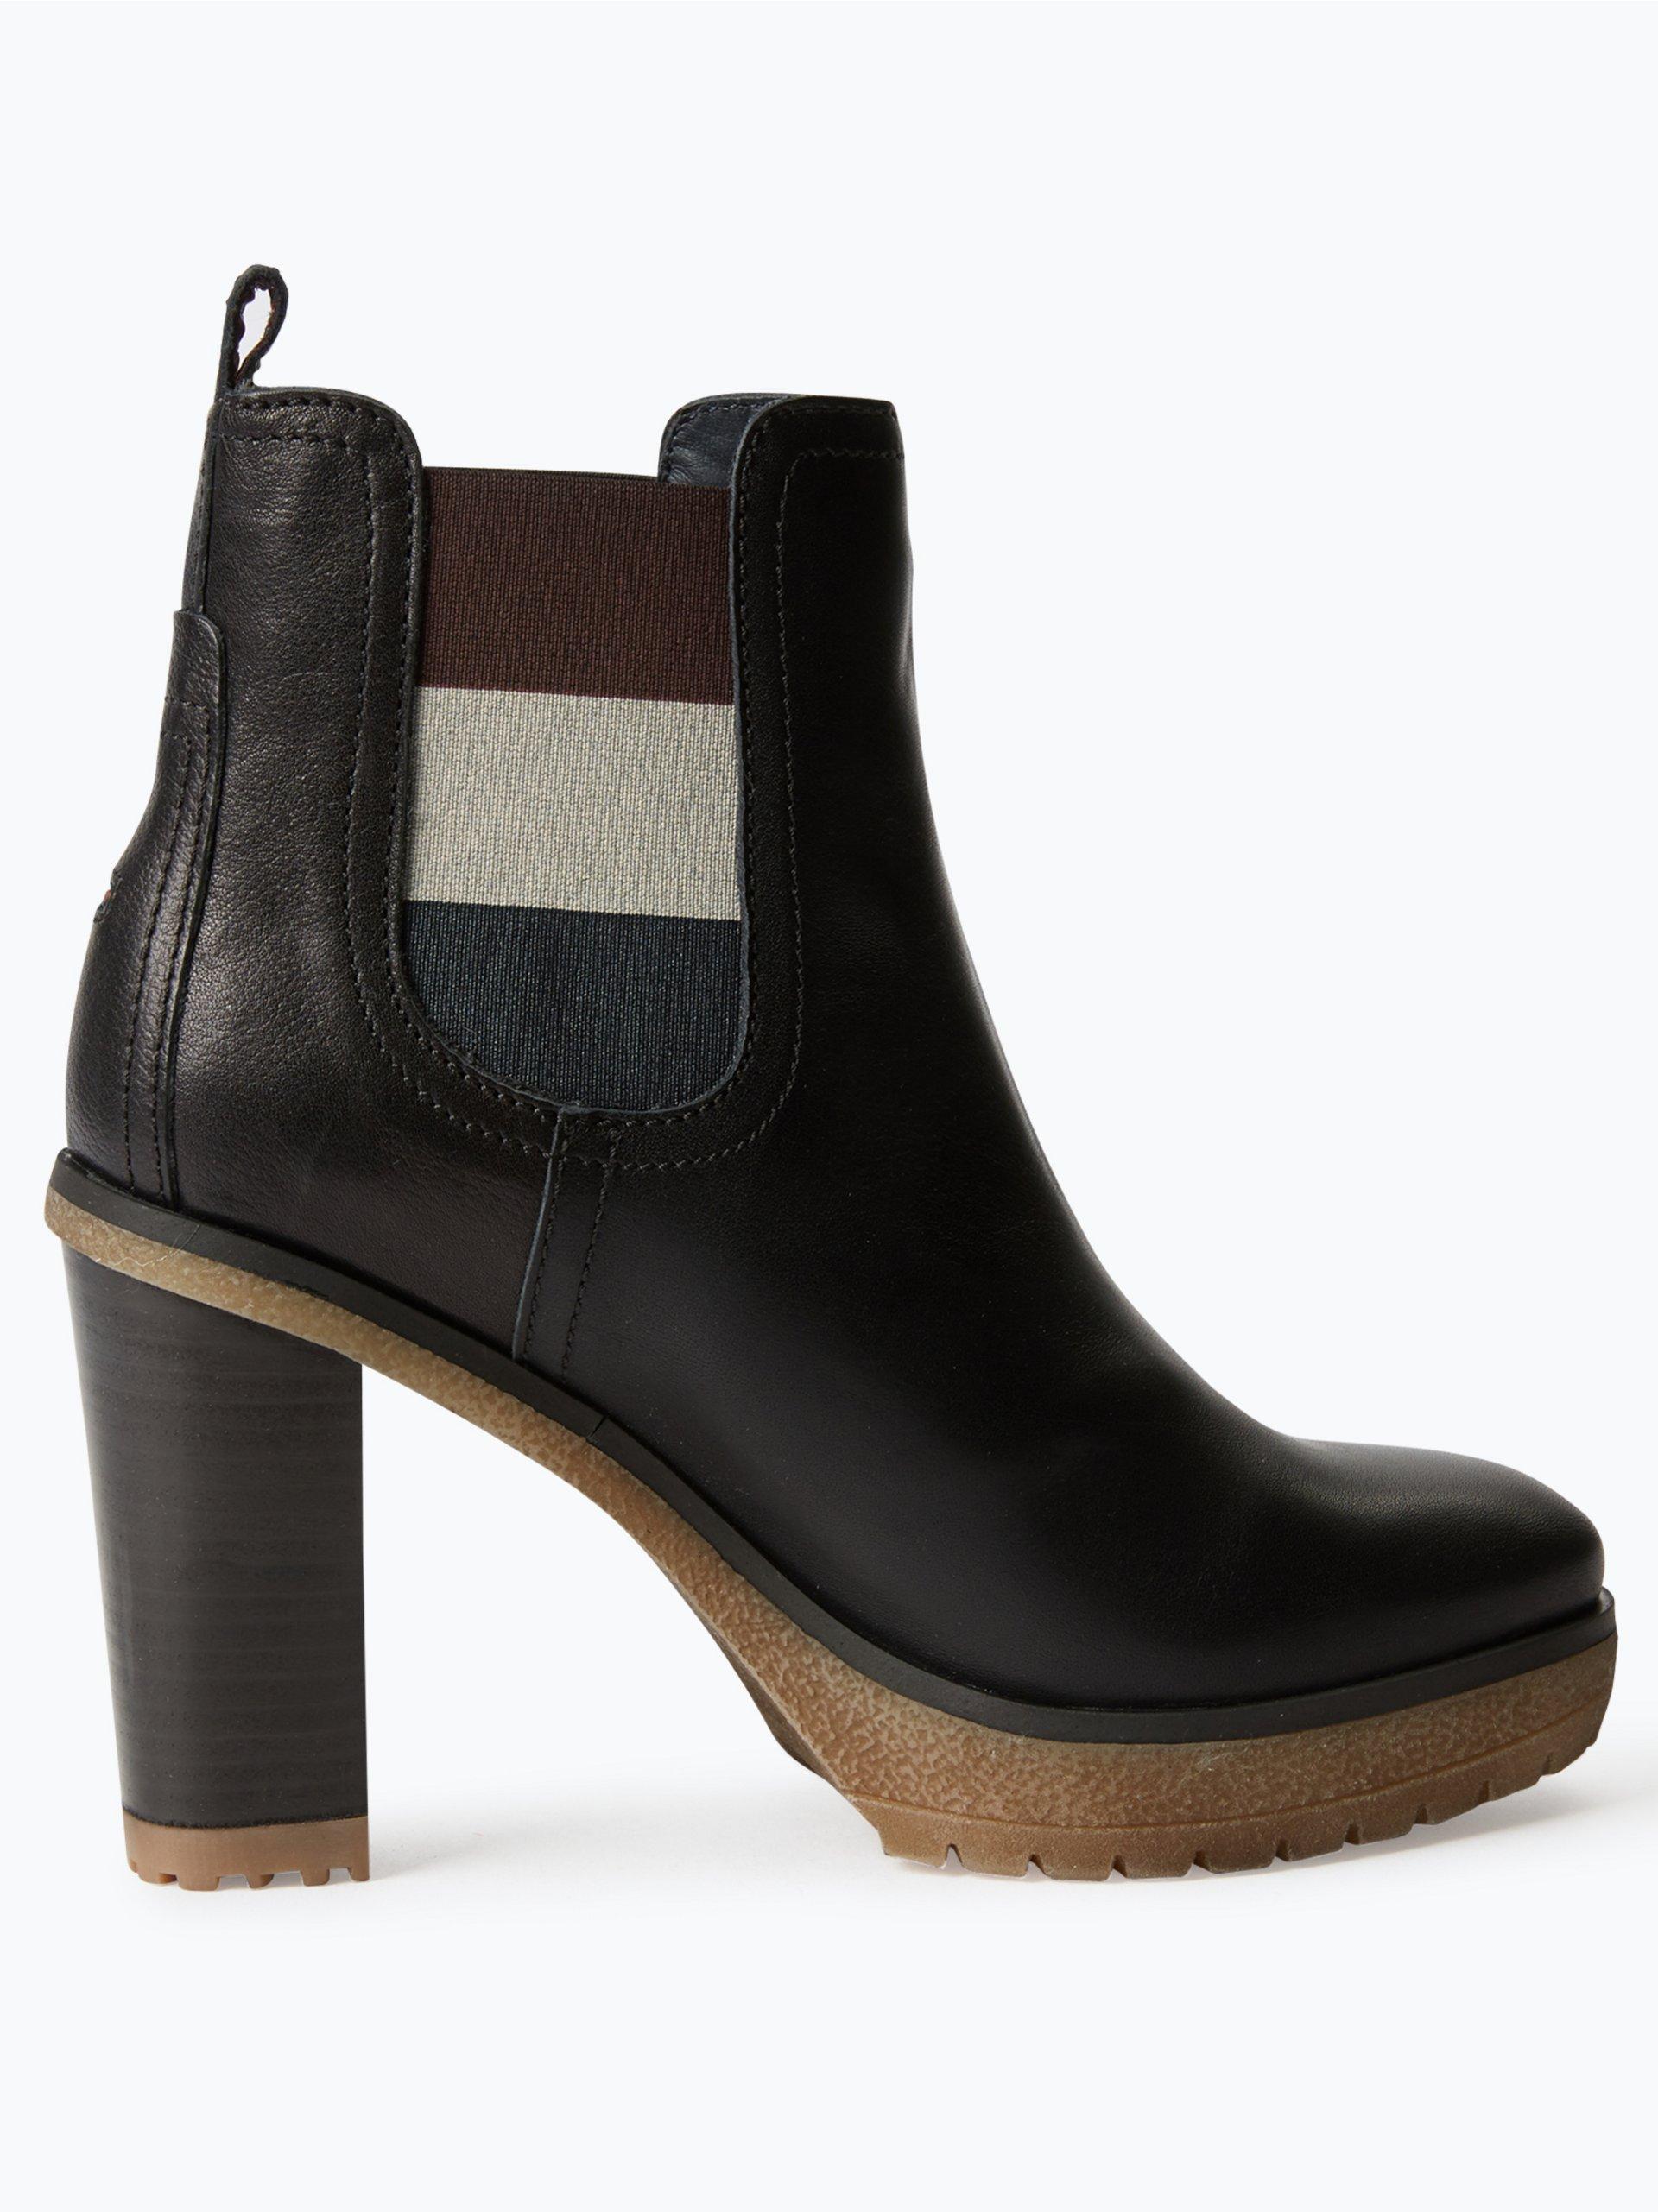 tommy jeans damen stiefeletten aus leder schwarz uni. Black Bedroom Furniture Sets. Home Design Ideas